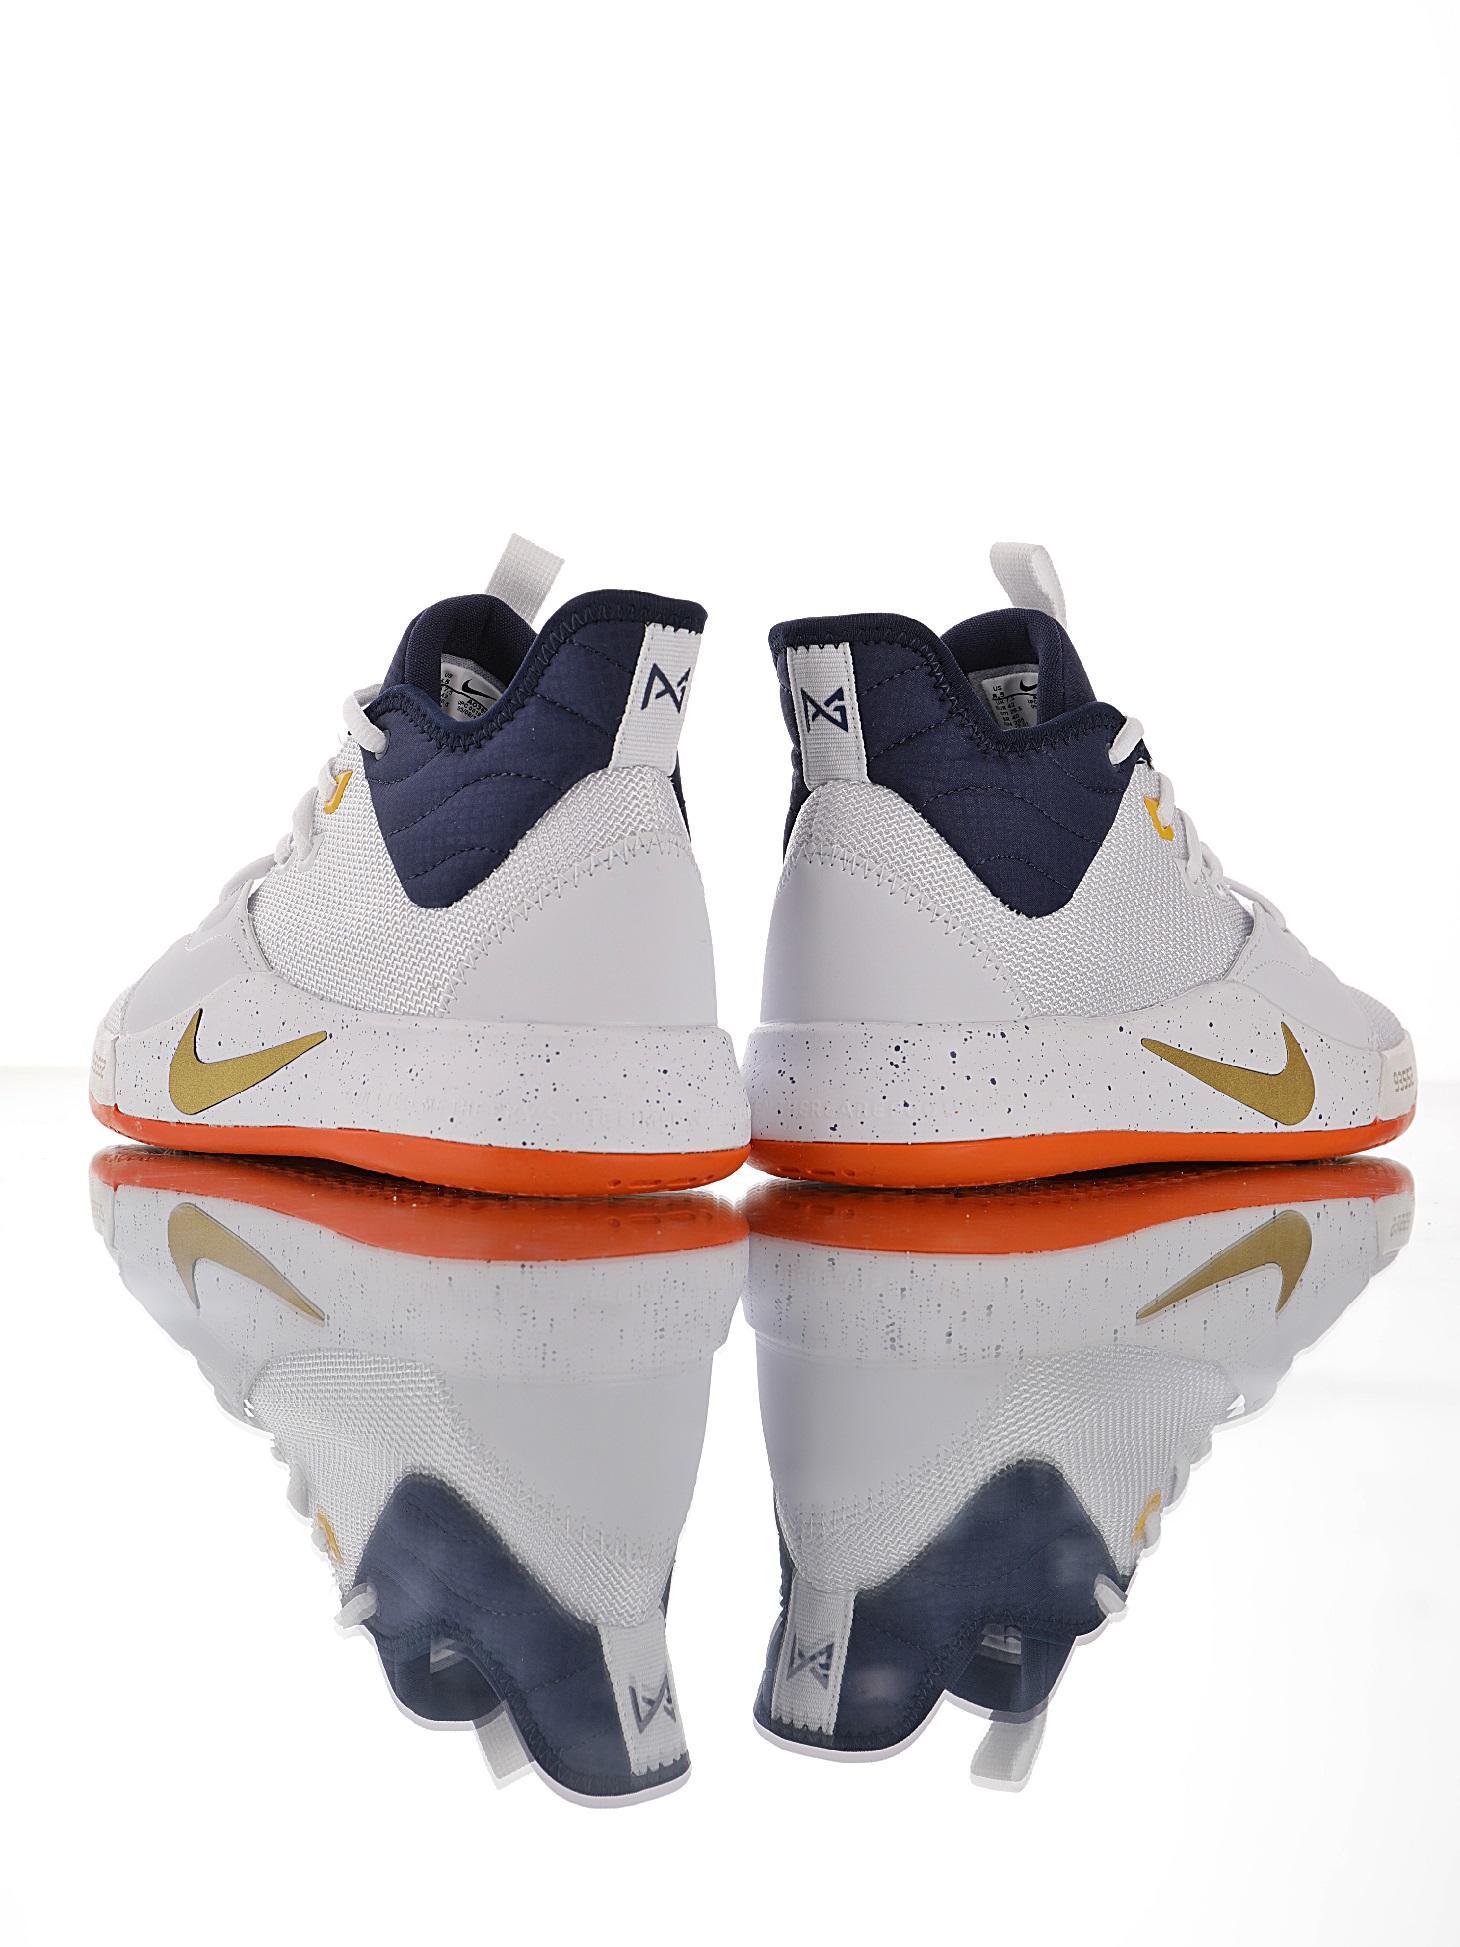 nba球星鞋码_偏小一码,男鞋真标带半码 NBA 球星保罗·乔治的签名鞋 耐克Nike ...